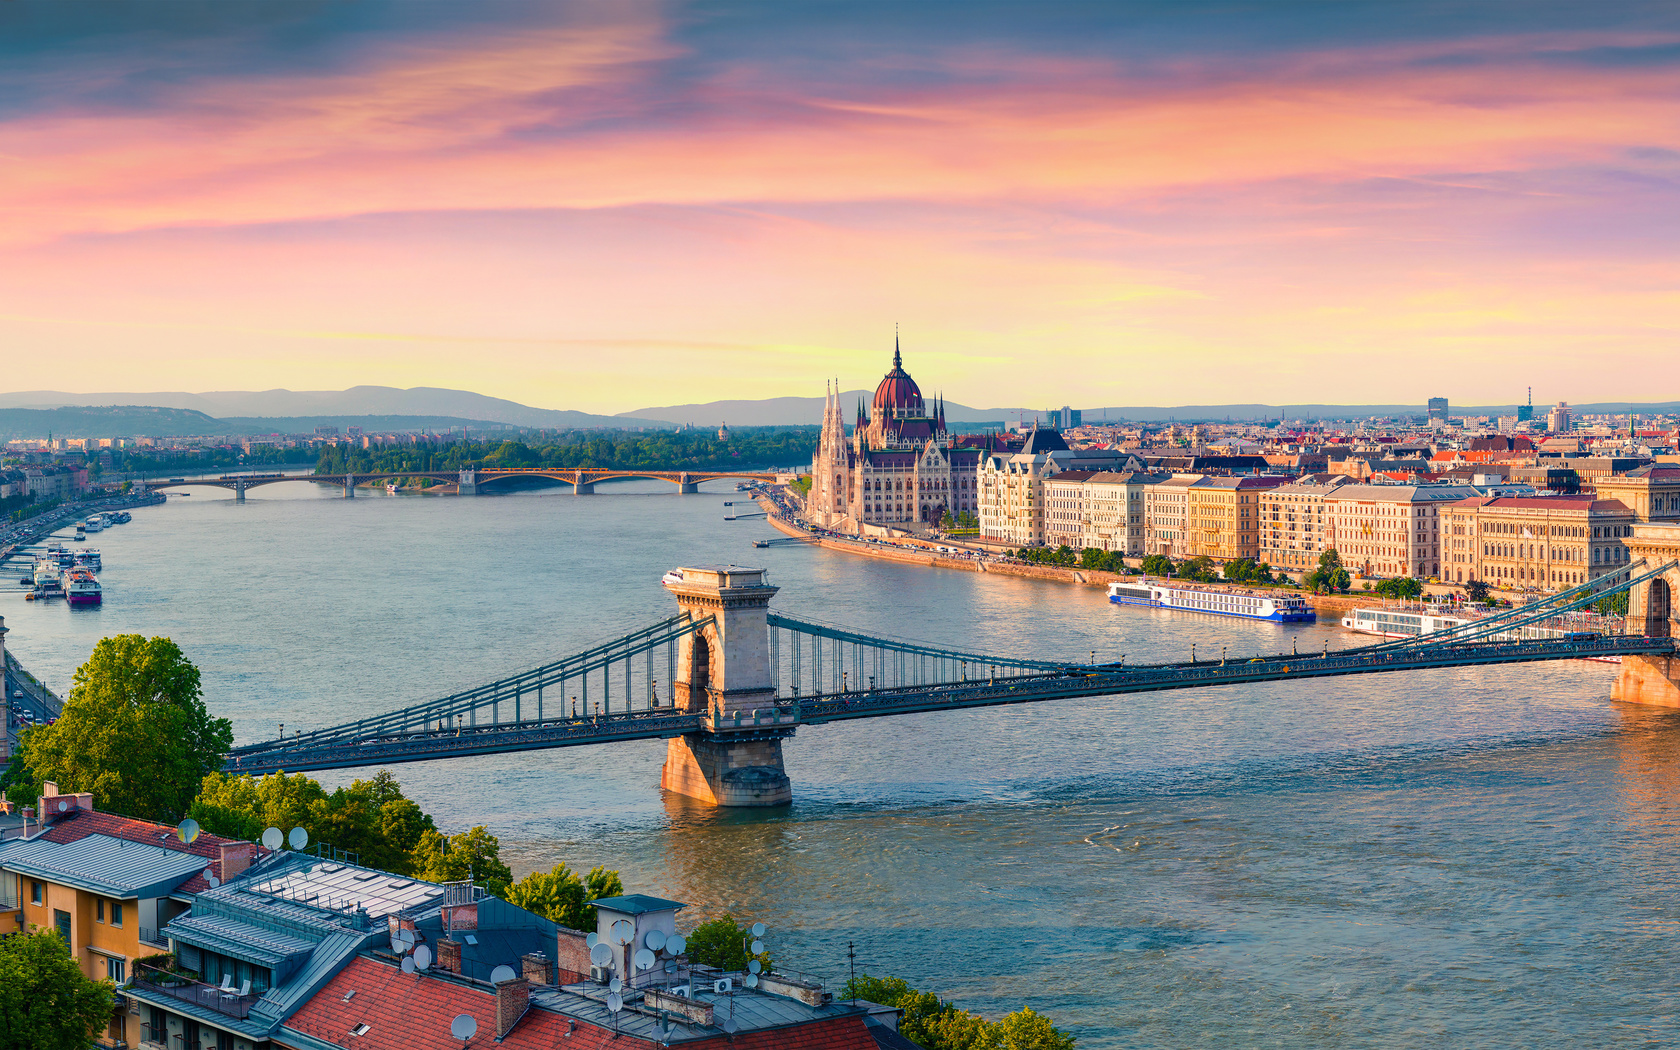 широкоформатные, панорама, мост, речные суда, будапешт, венгрия, danube, chain bridge, горизонт, сверху, город